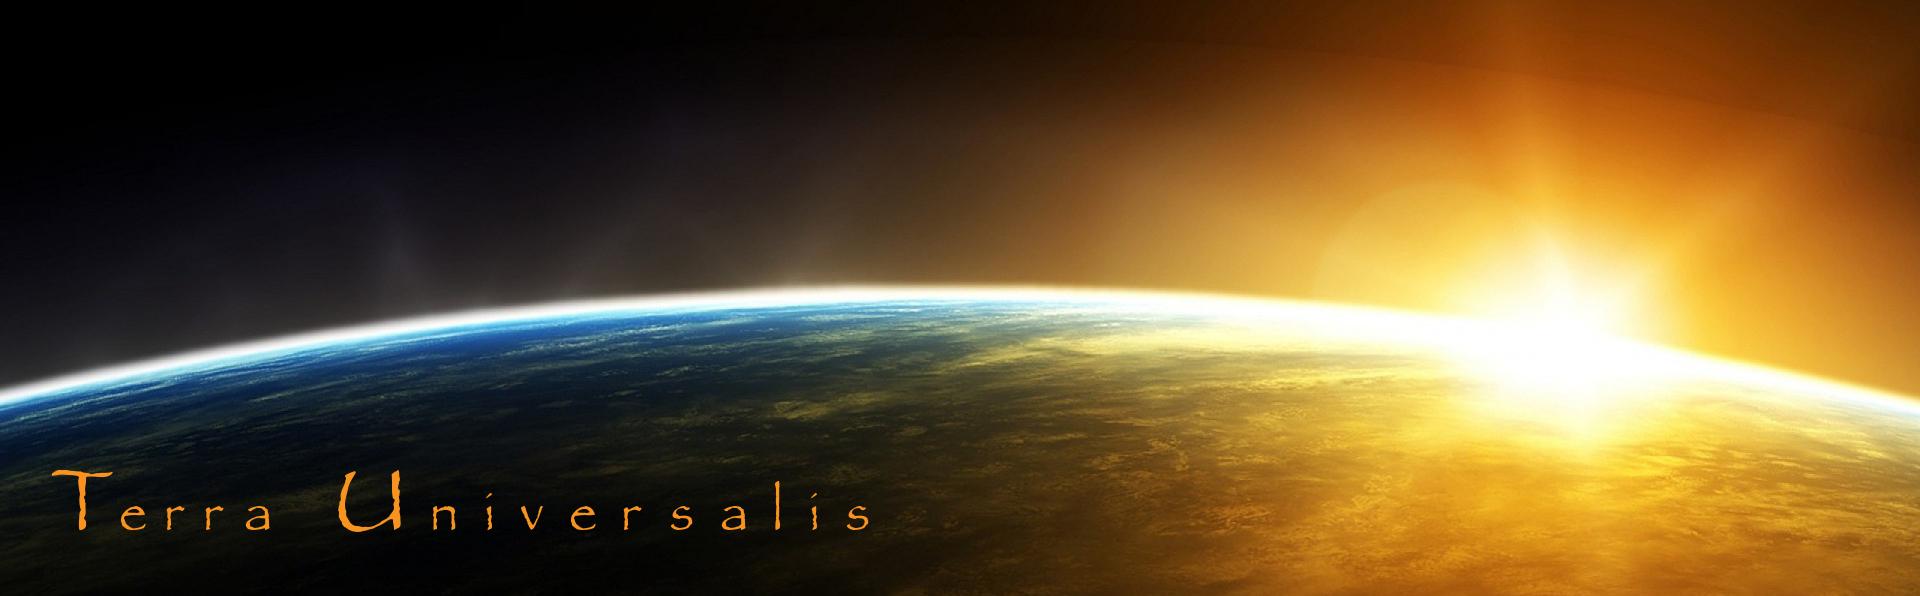 Terra Universalis